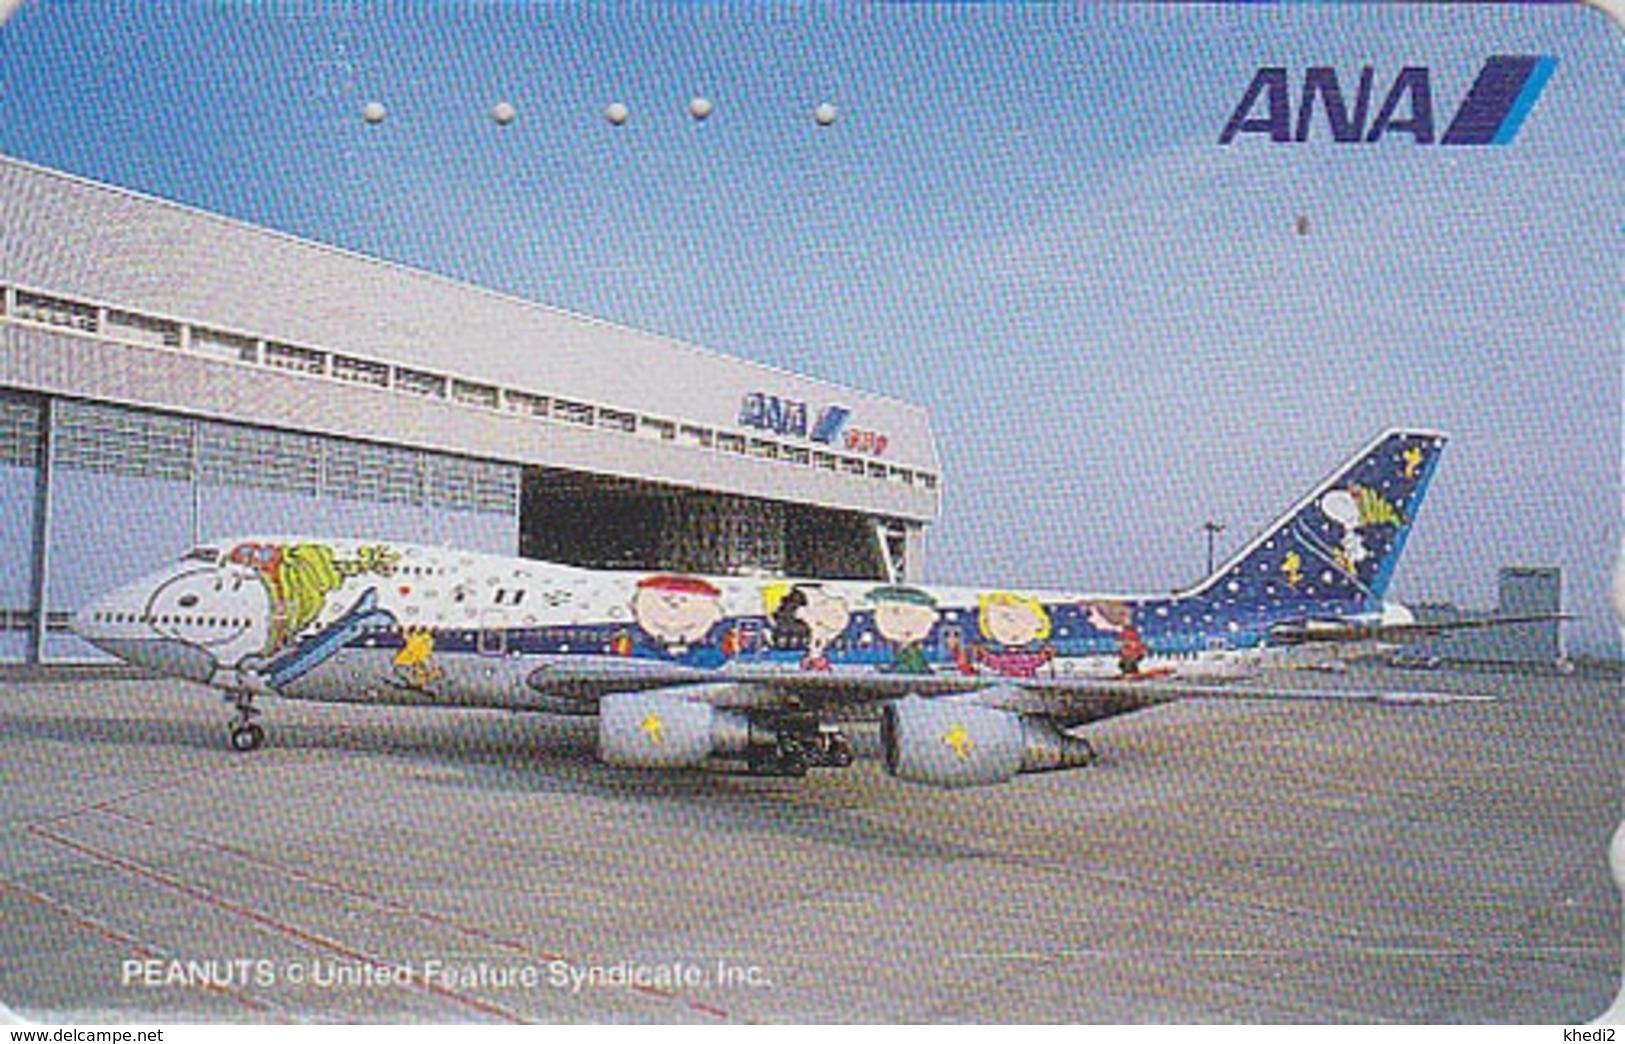 TC Japon / 110-016 - BD Comics - CHIEN SNOOPY * AVION ANA AIRLINES *  - PEANUTS DOG Japan Phonecard - Aviation 1375 - Avions